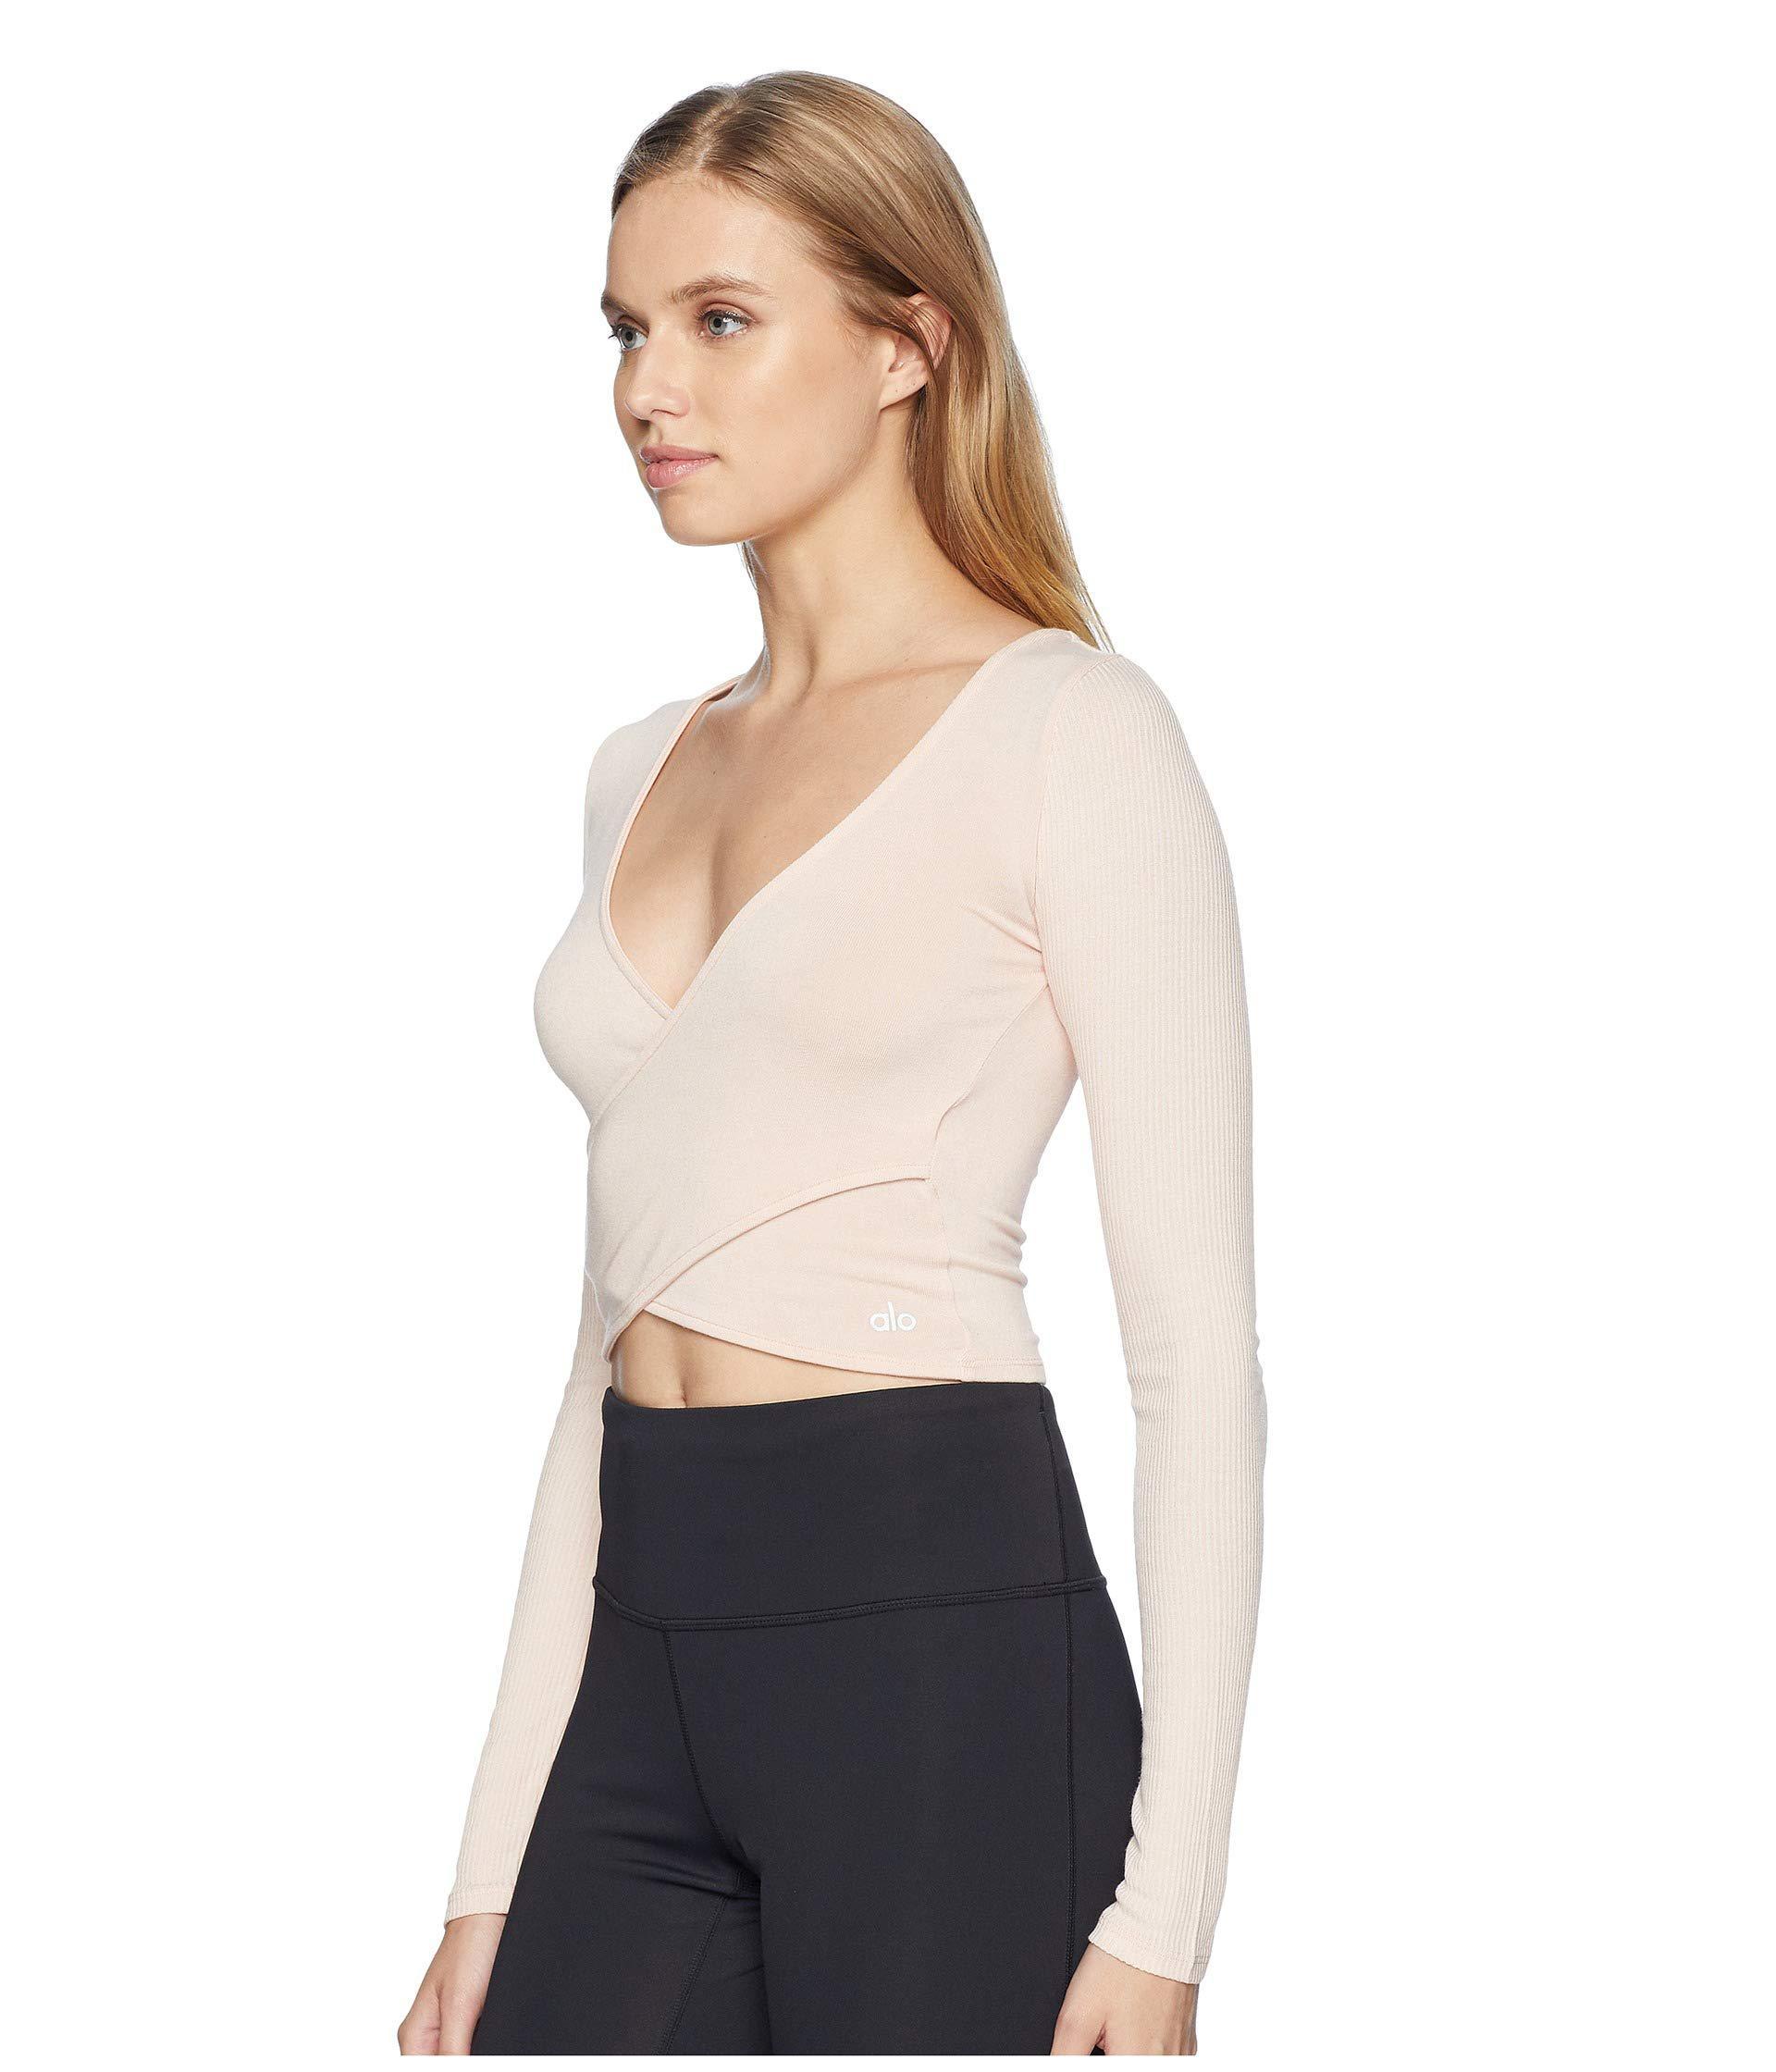 4785d0995b36c Lyst - Alo Yoga Amelia Long Sleeve Crop Top (black) Women s Clothing